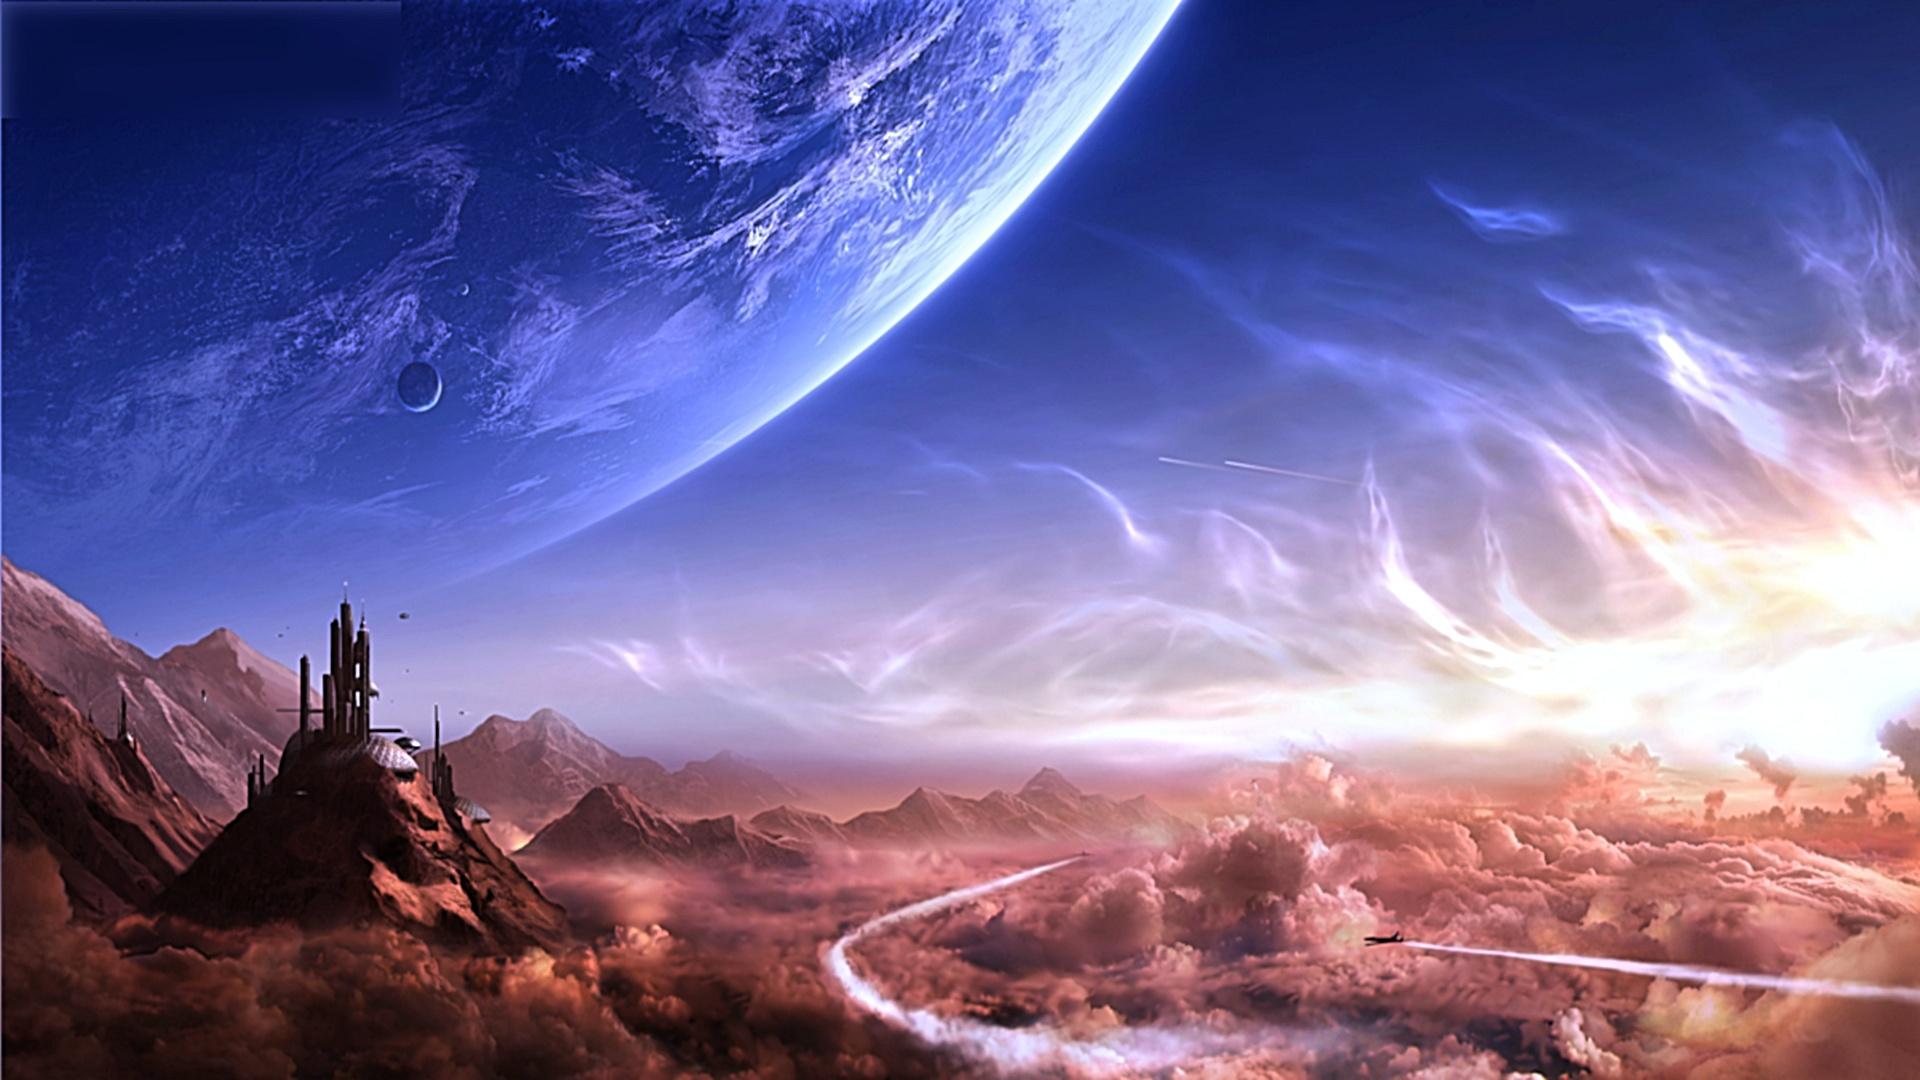 Fantasy Nature Landscape